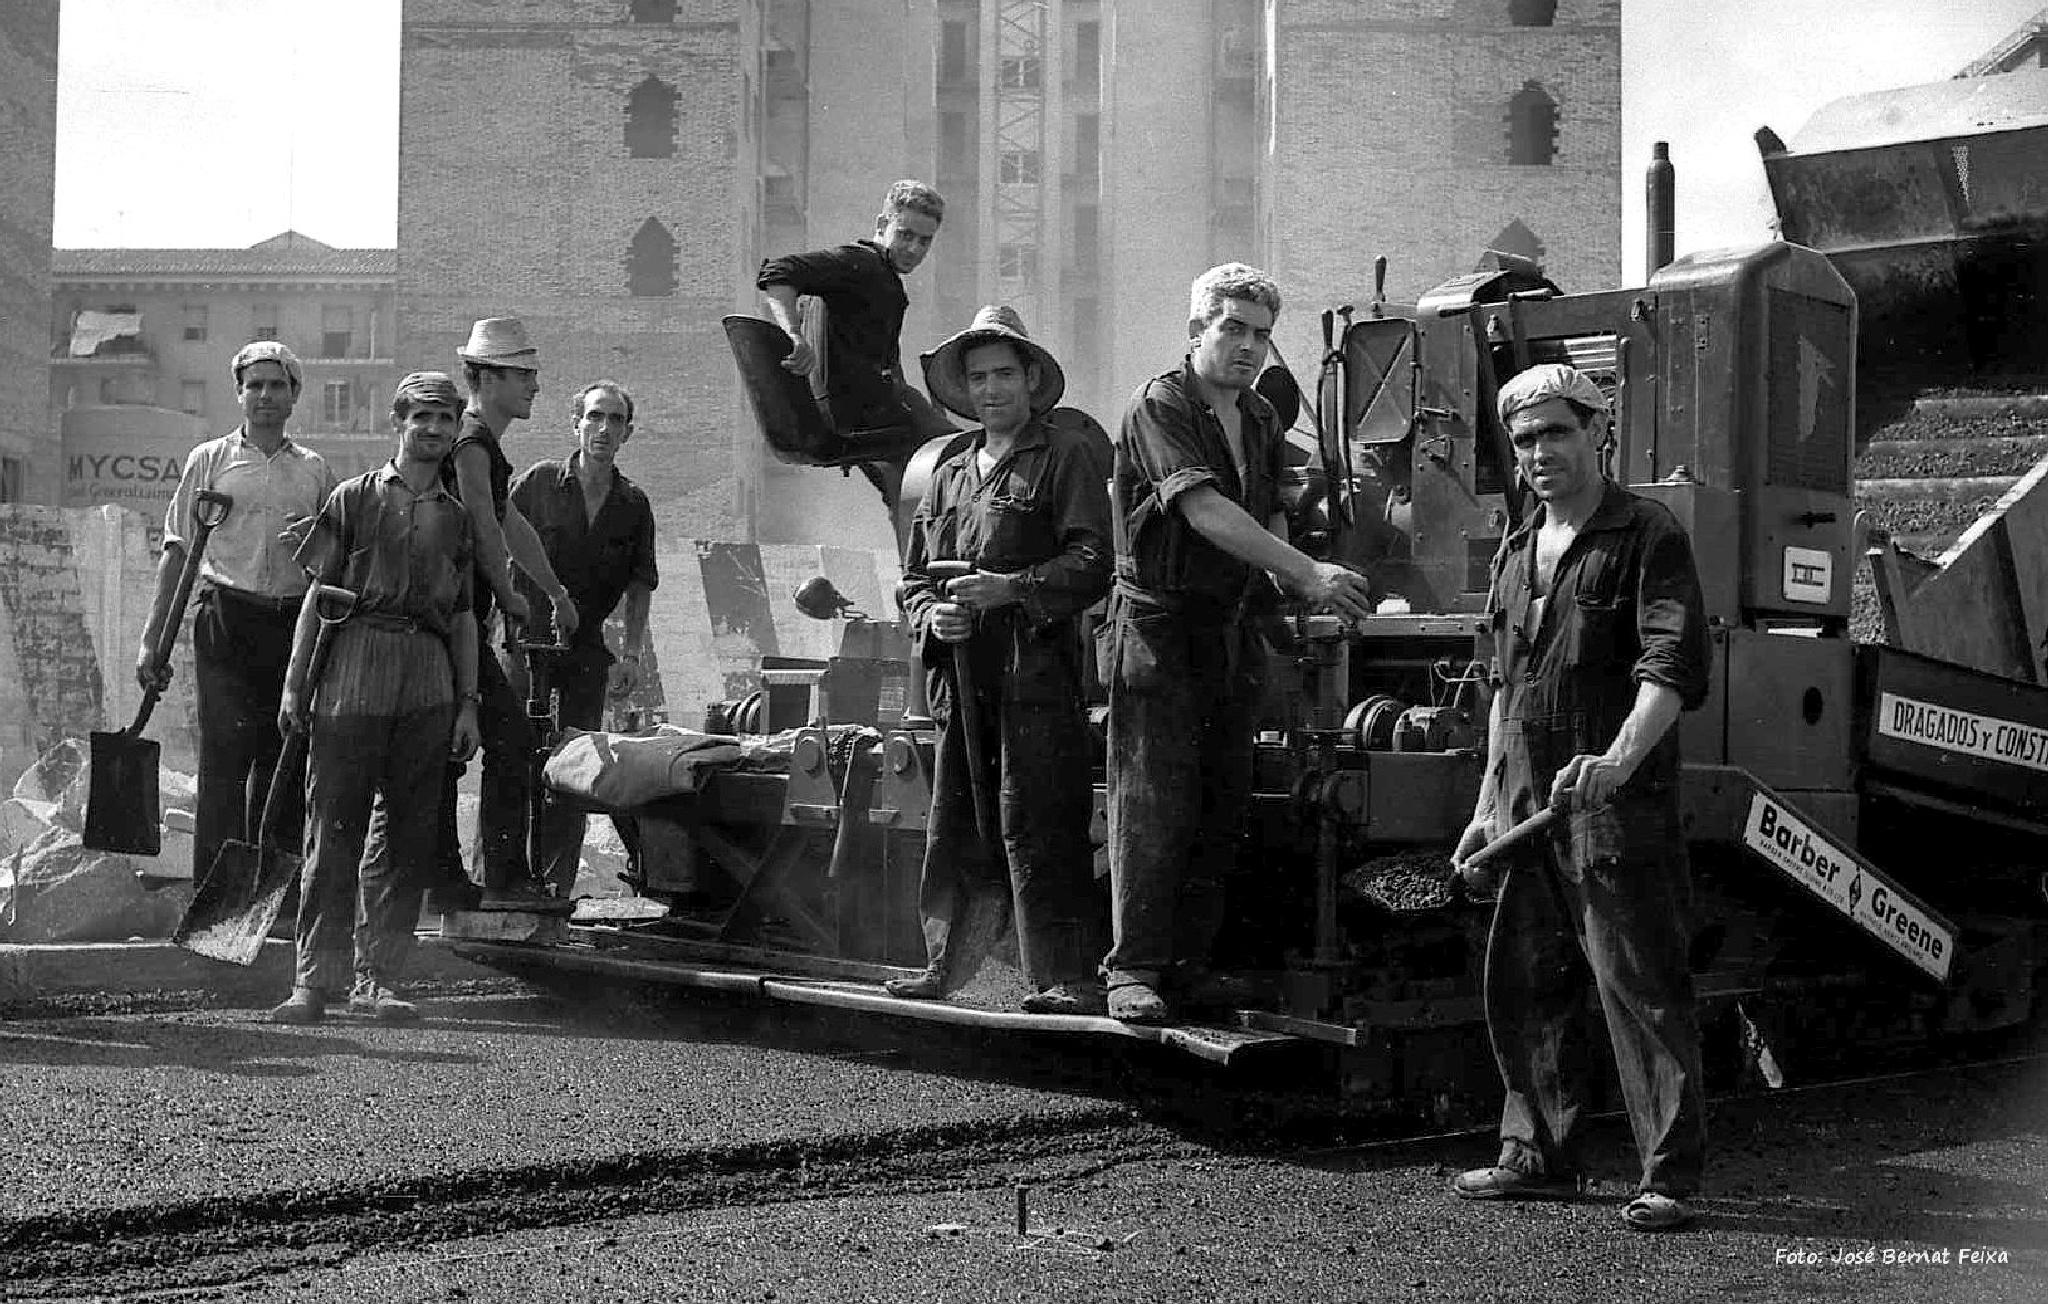 Retrato de trabajadores de la carretera, Portret van wegwerkers, Portrait of road workers (60's) by José Bernat Feixa